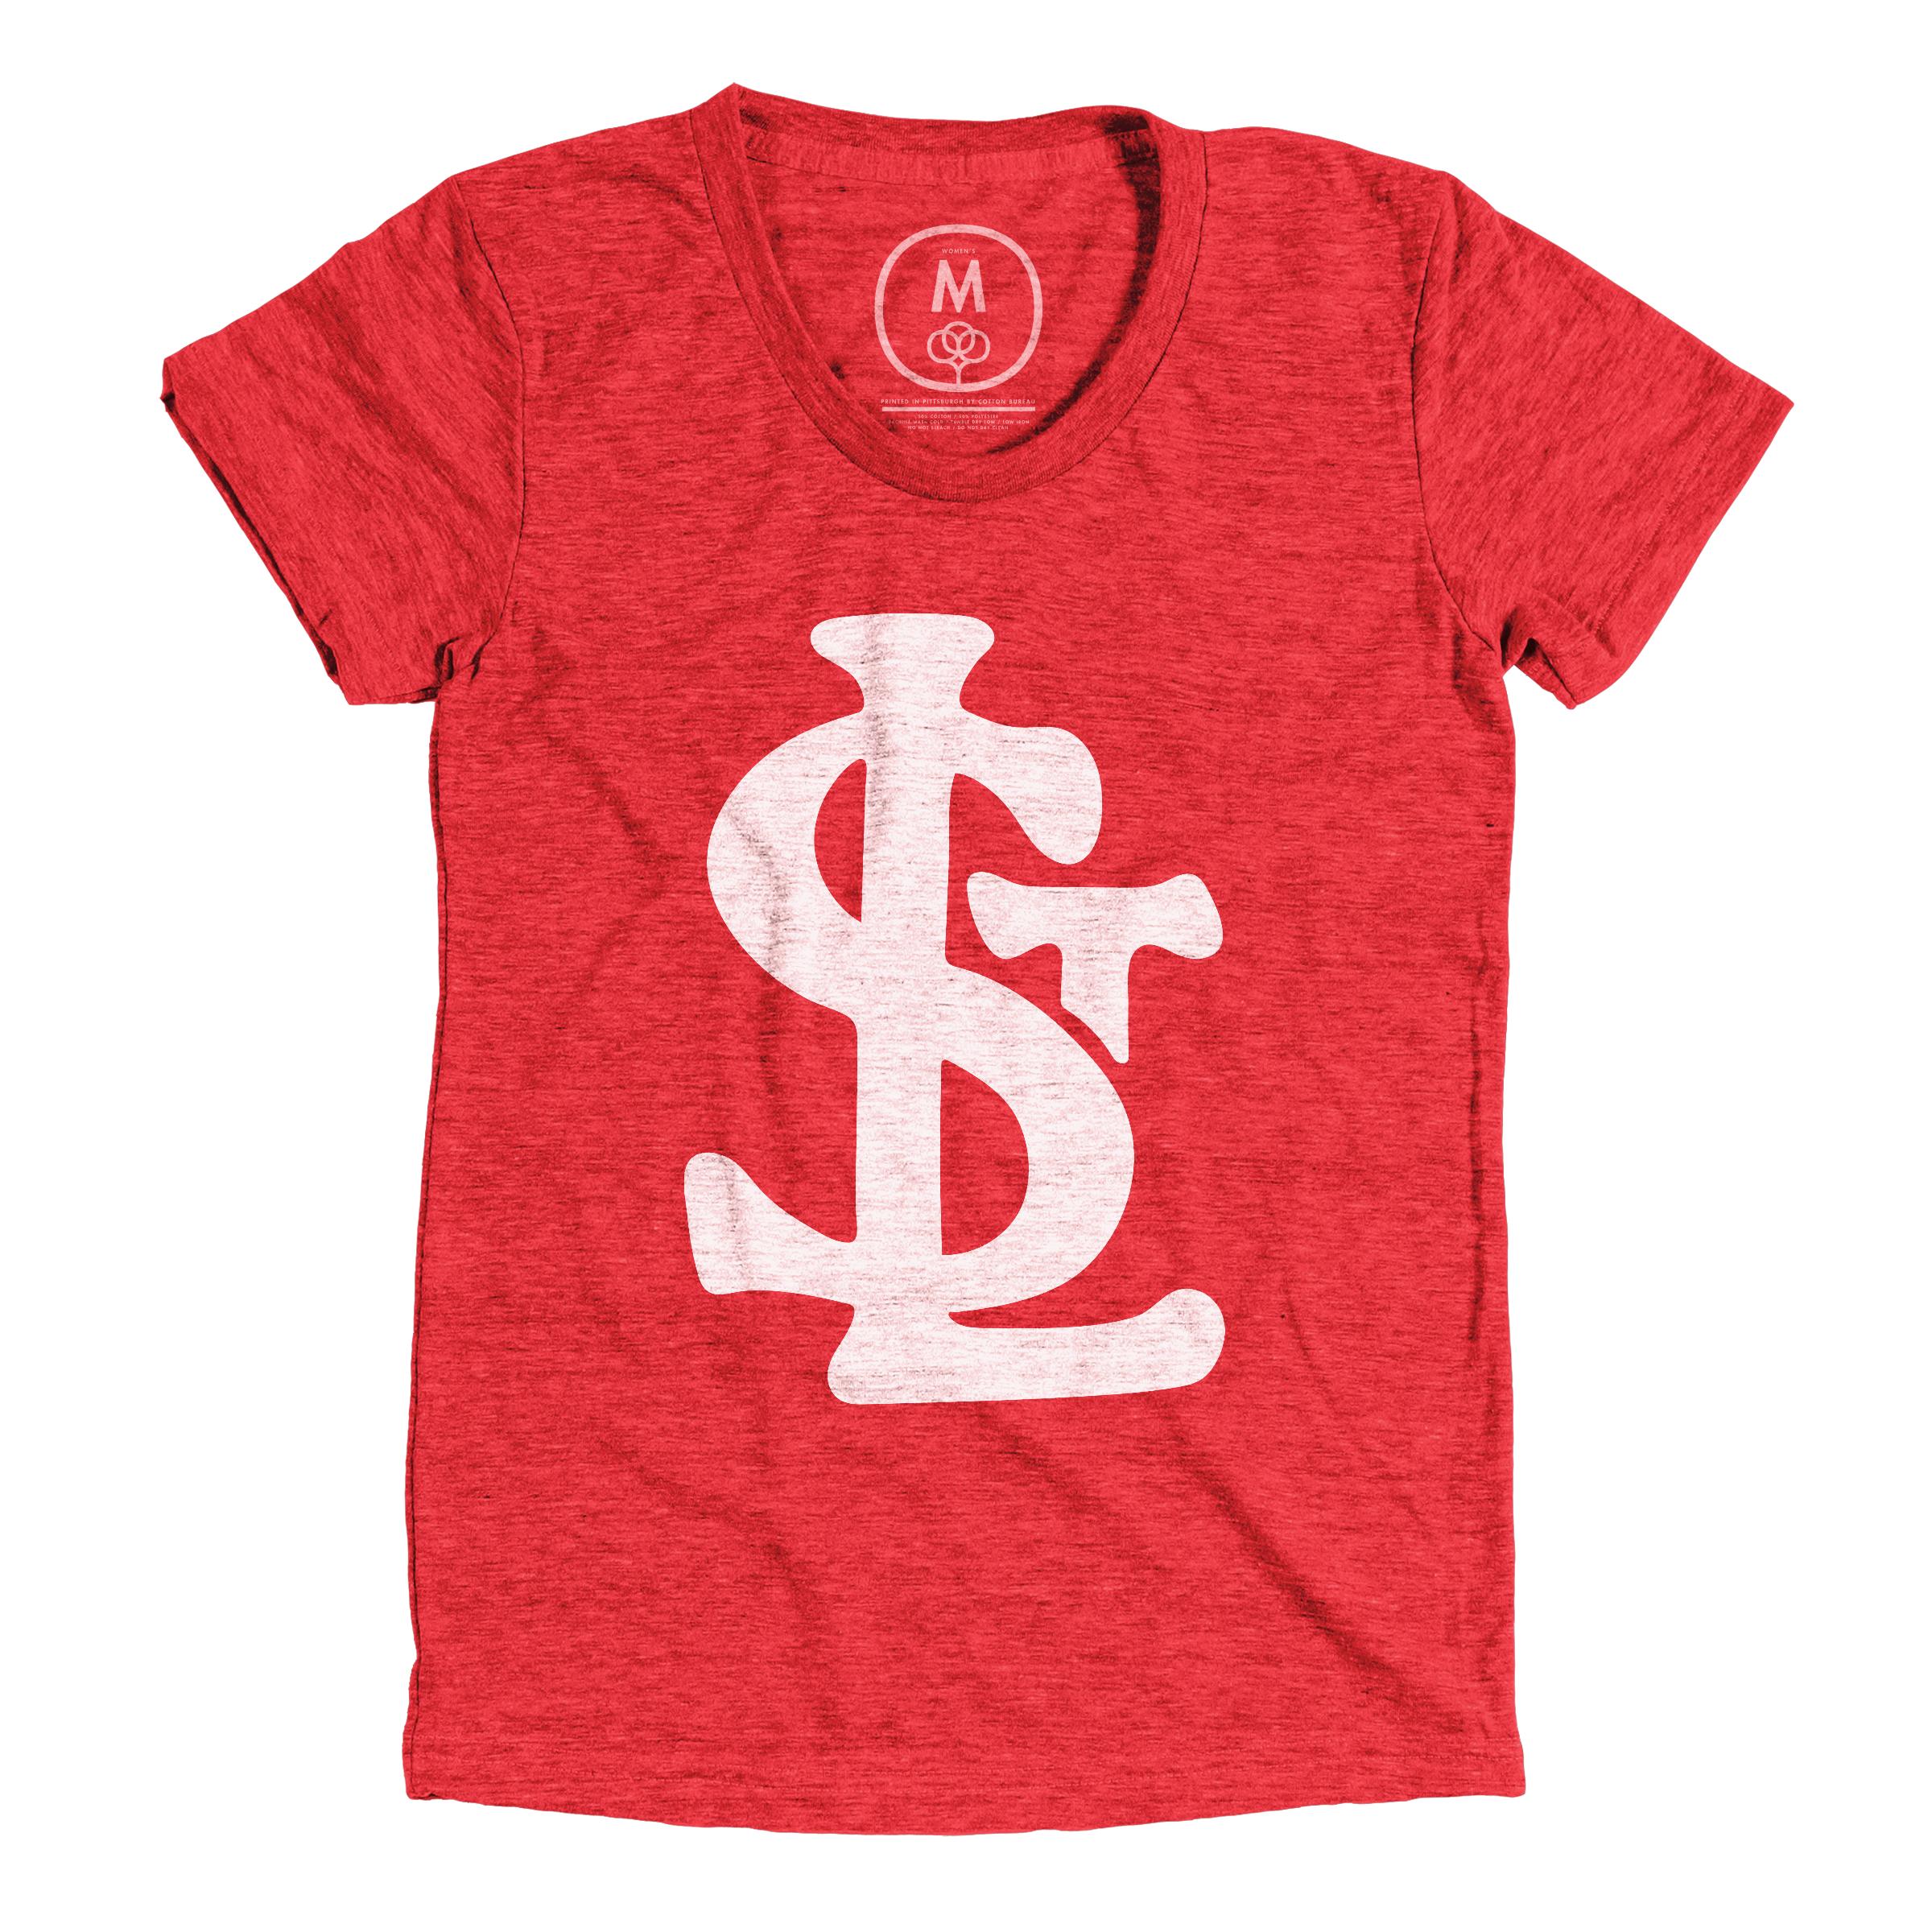 STL Vintage Red (Women's)